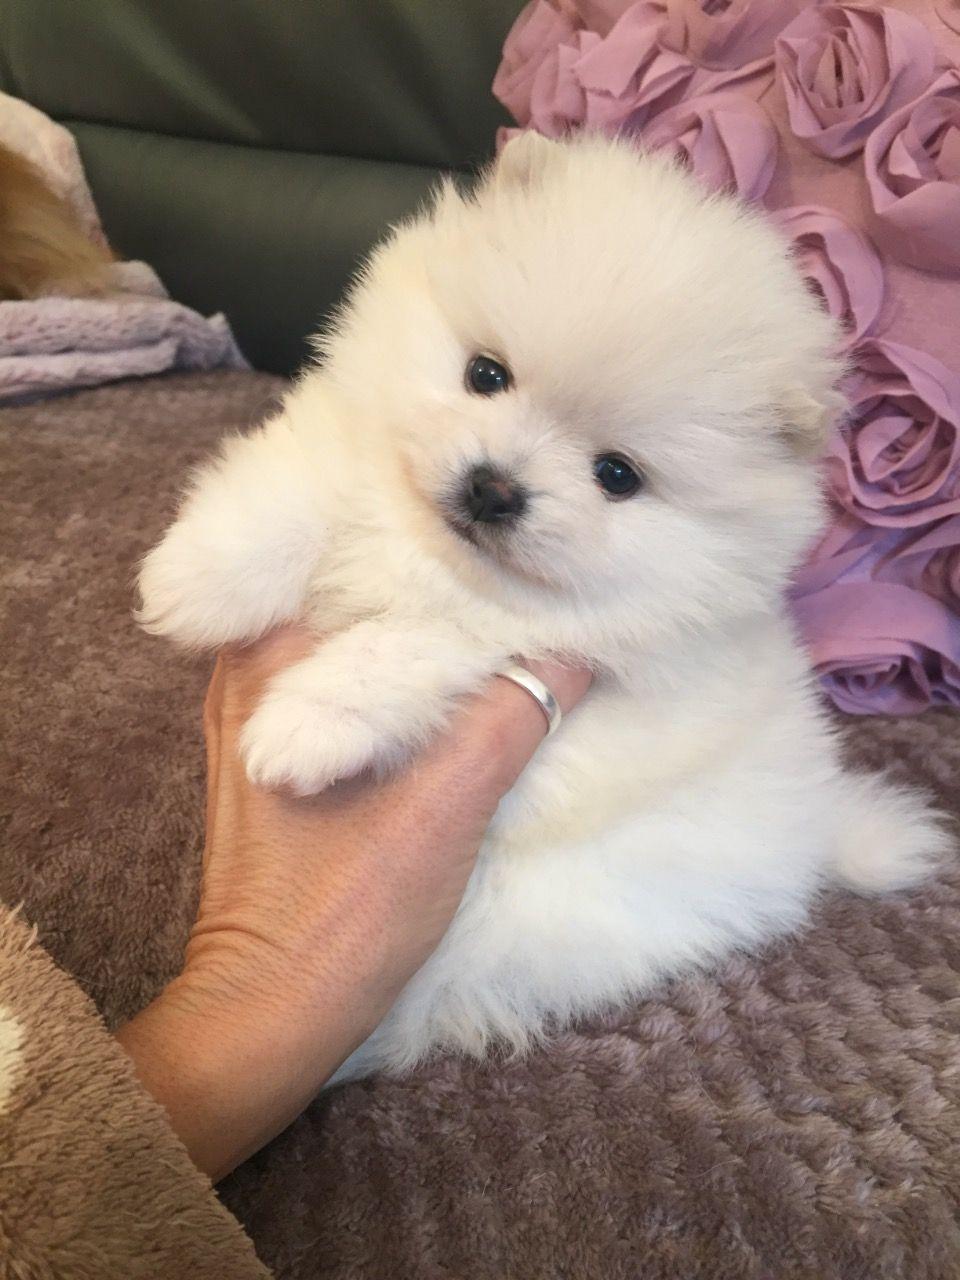 Pomeranian Puppies For Sale For Sale in Perth Australia